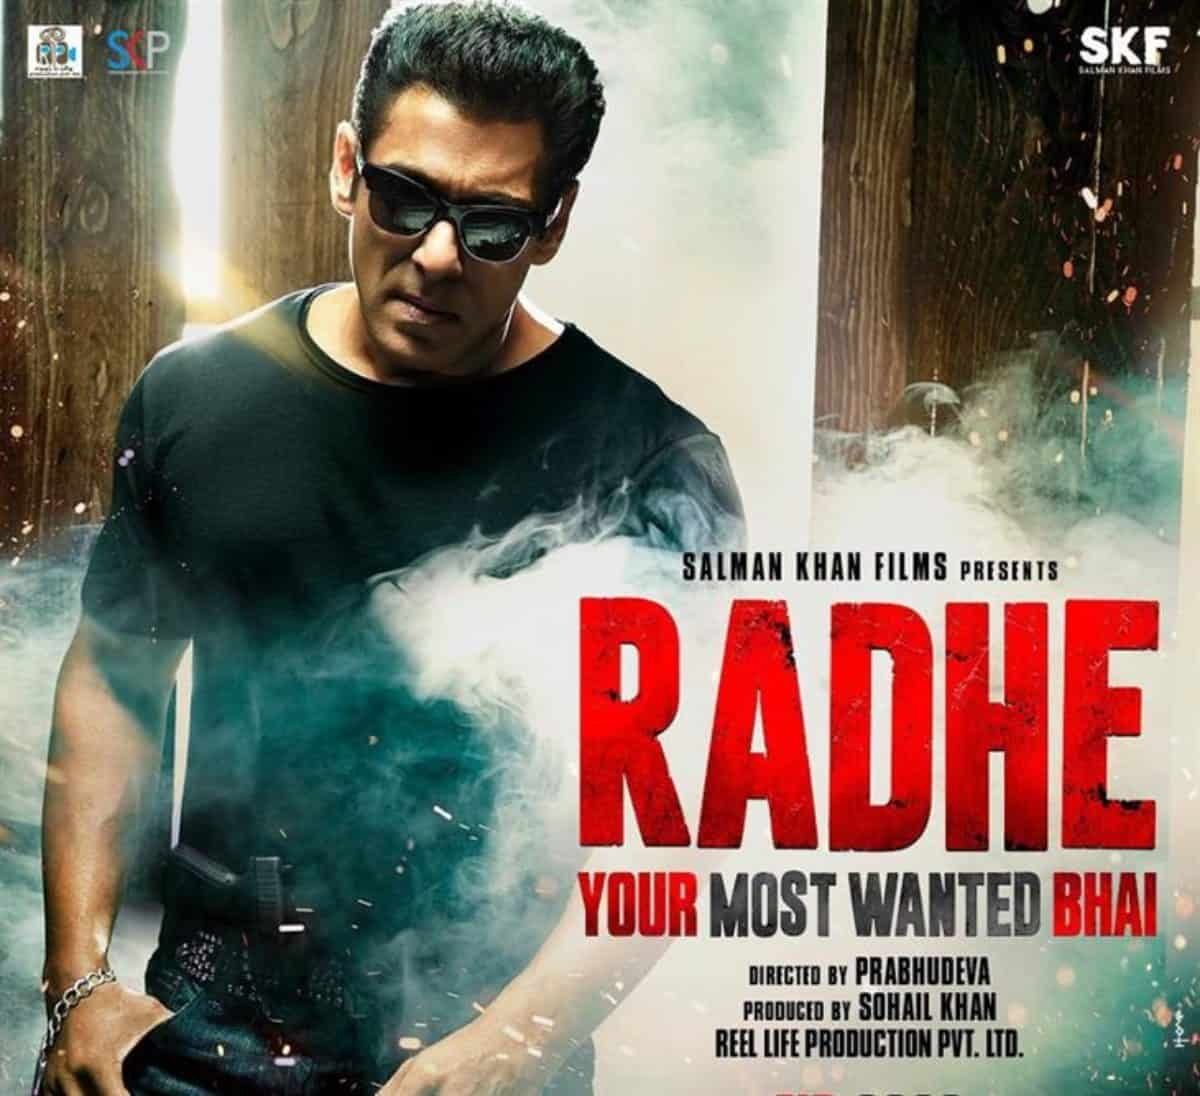 Bollywood lauds Salman Khan-starrer Radhe trailer, declare it 'blockbuster'